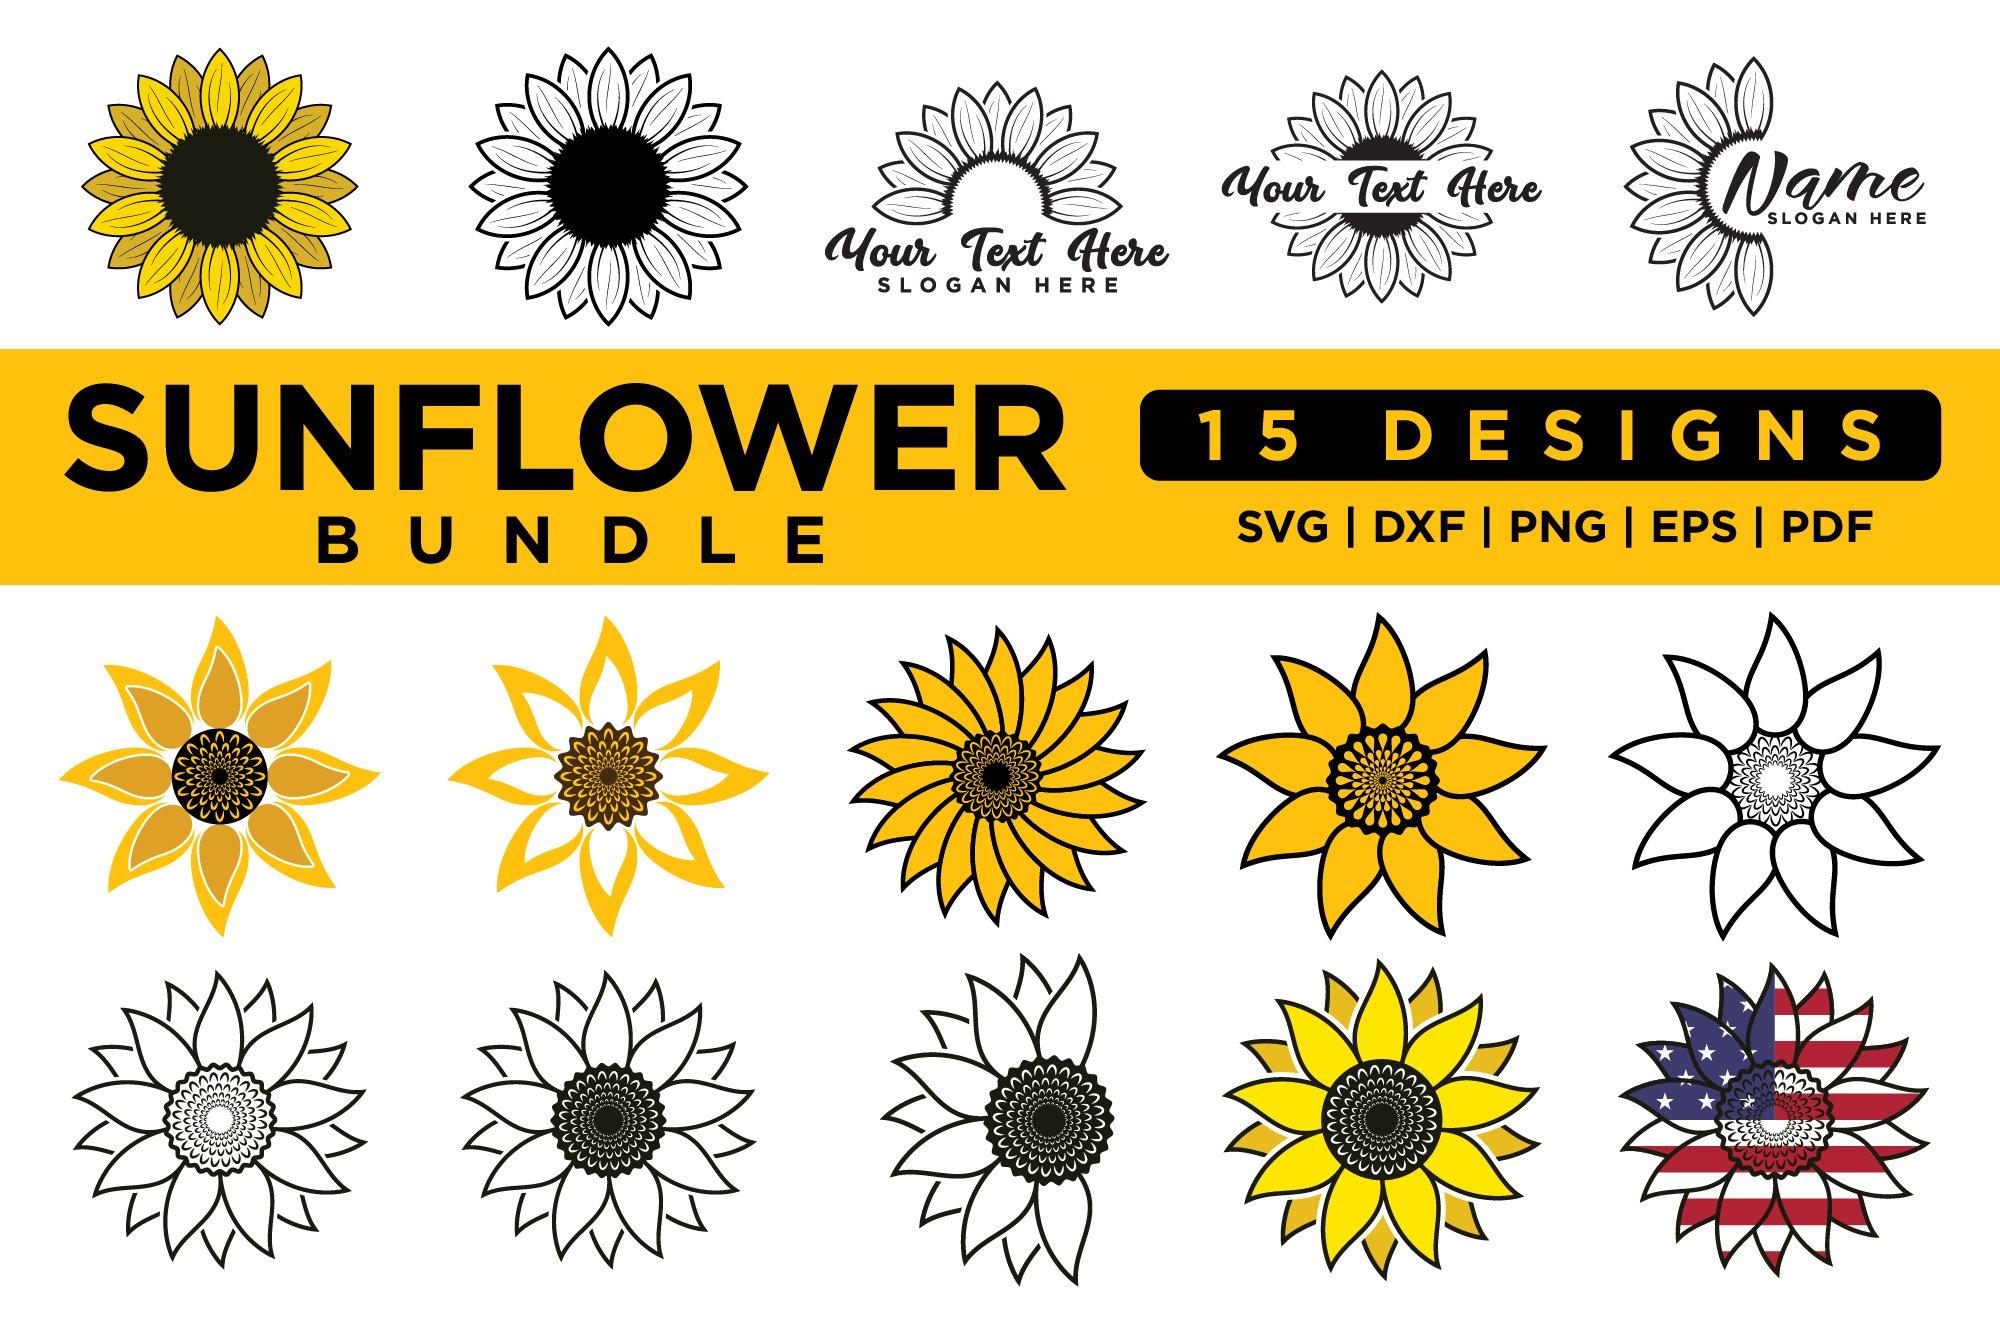 Sunflower SVG Bundle Vol.3 example image 1